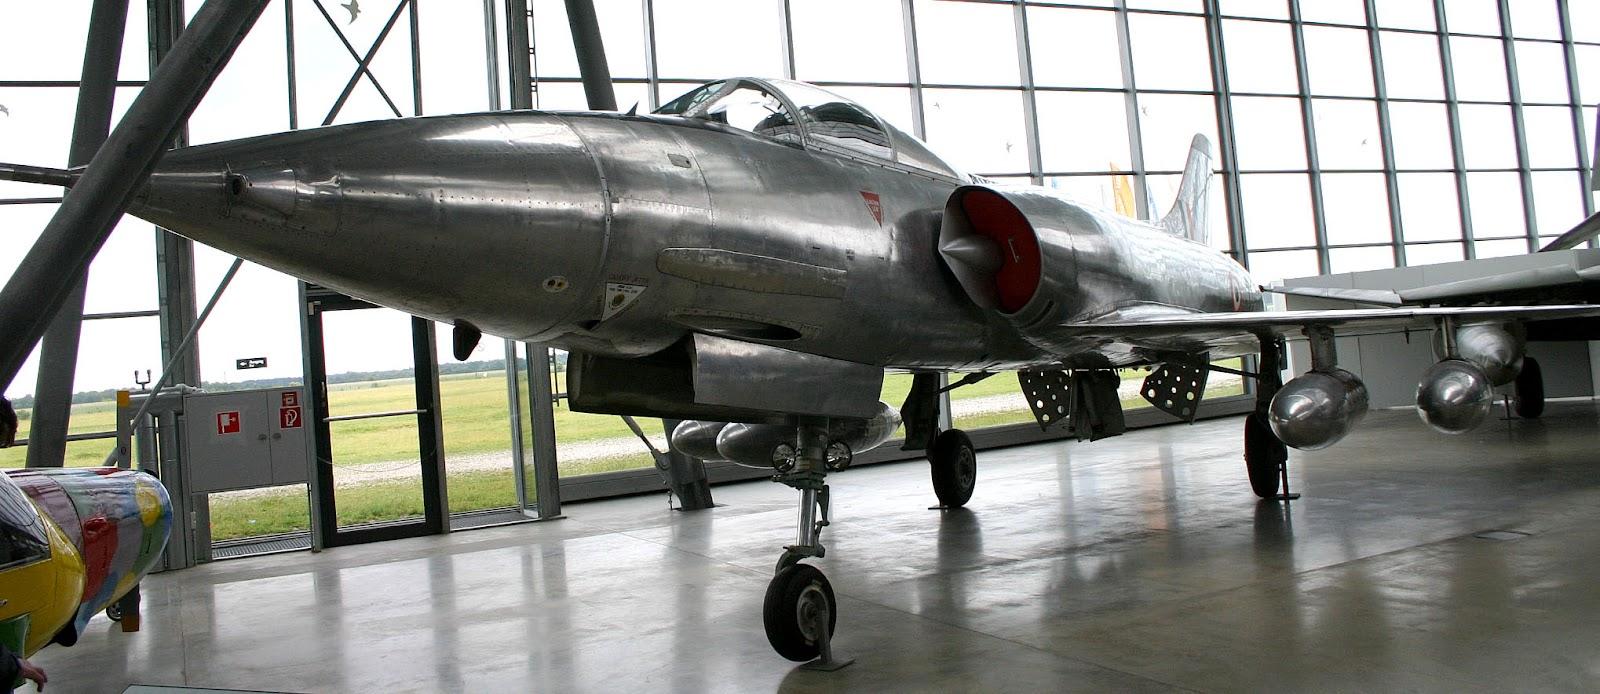 HAL-HF-24-Marut.jpg